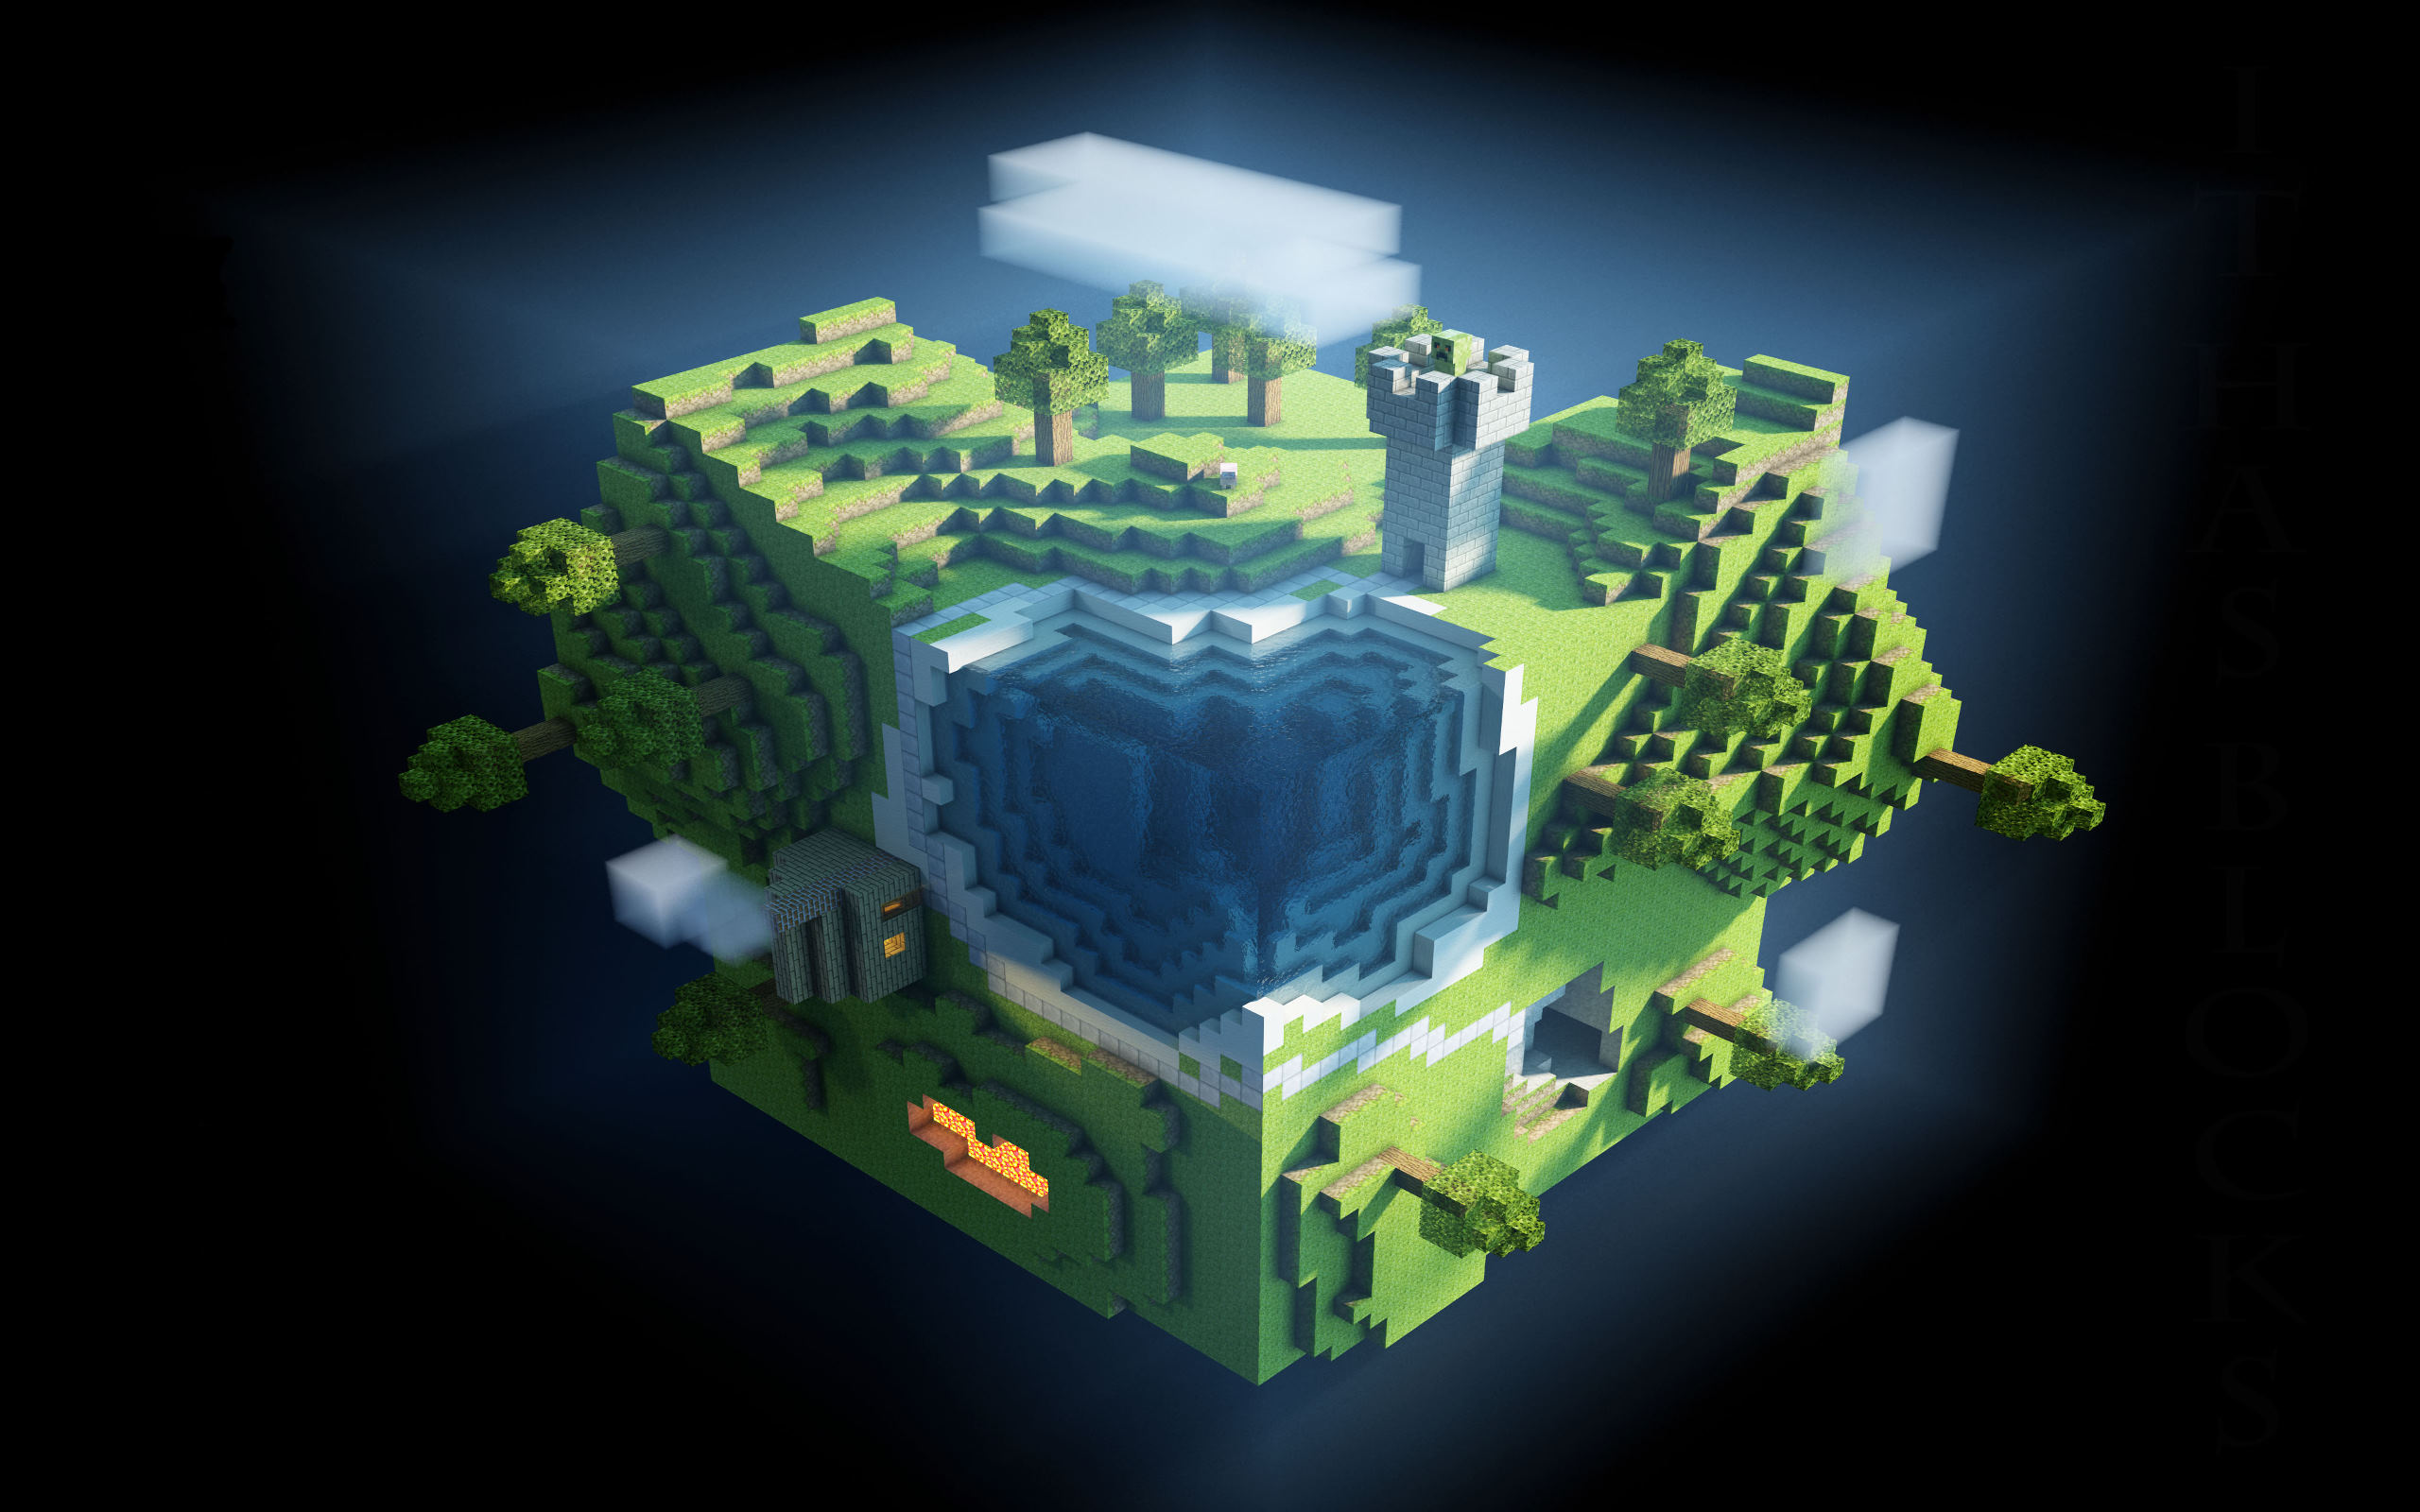 Minecraft-Cube-World-Wallpaper-HD-Minecraft-Wallpaper